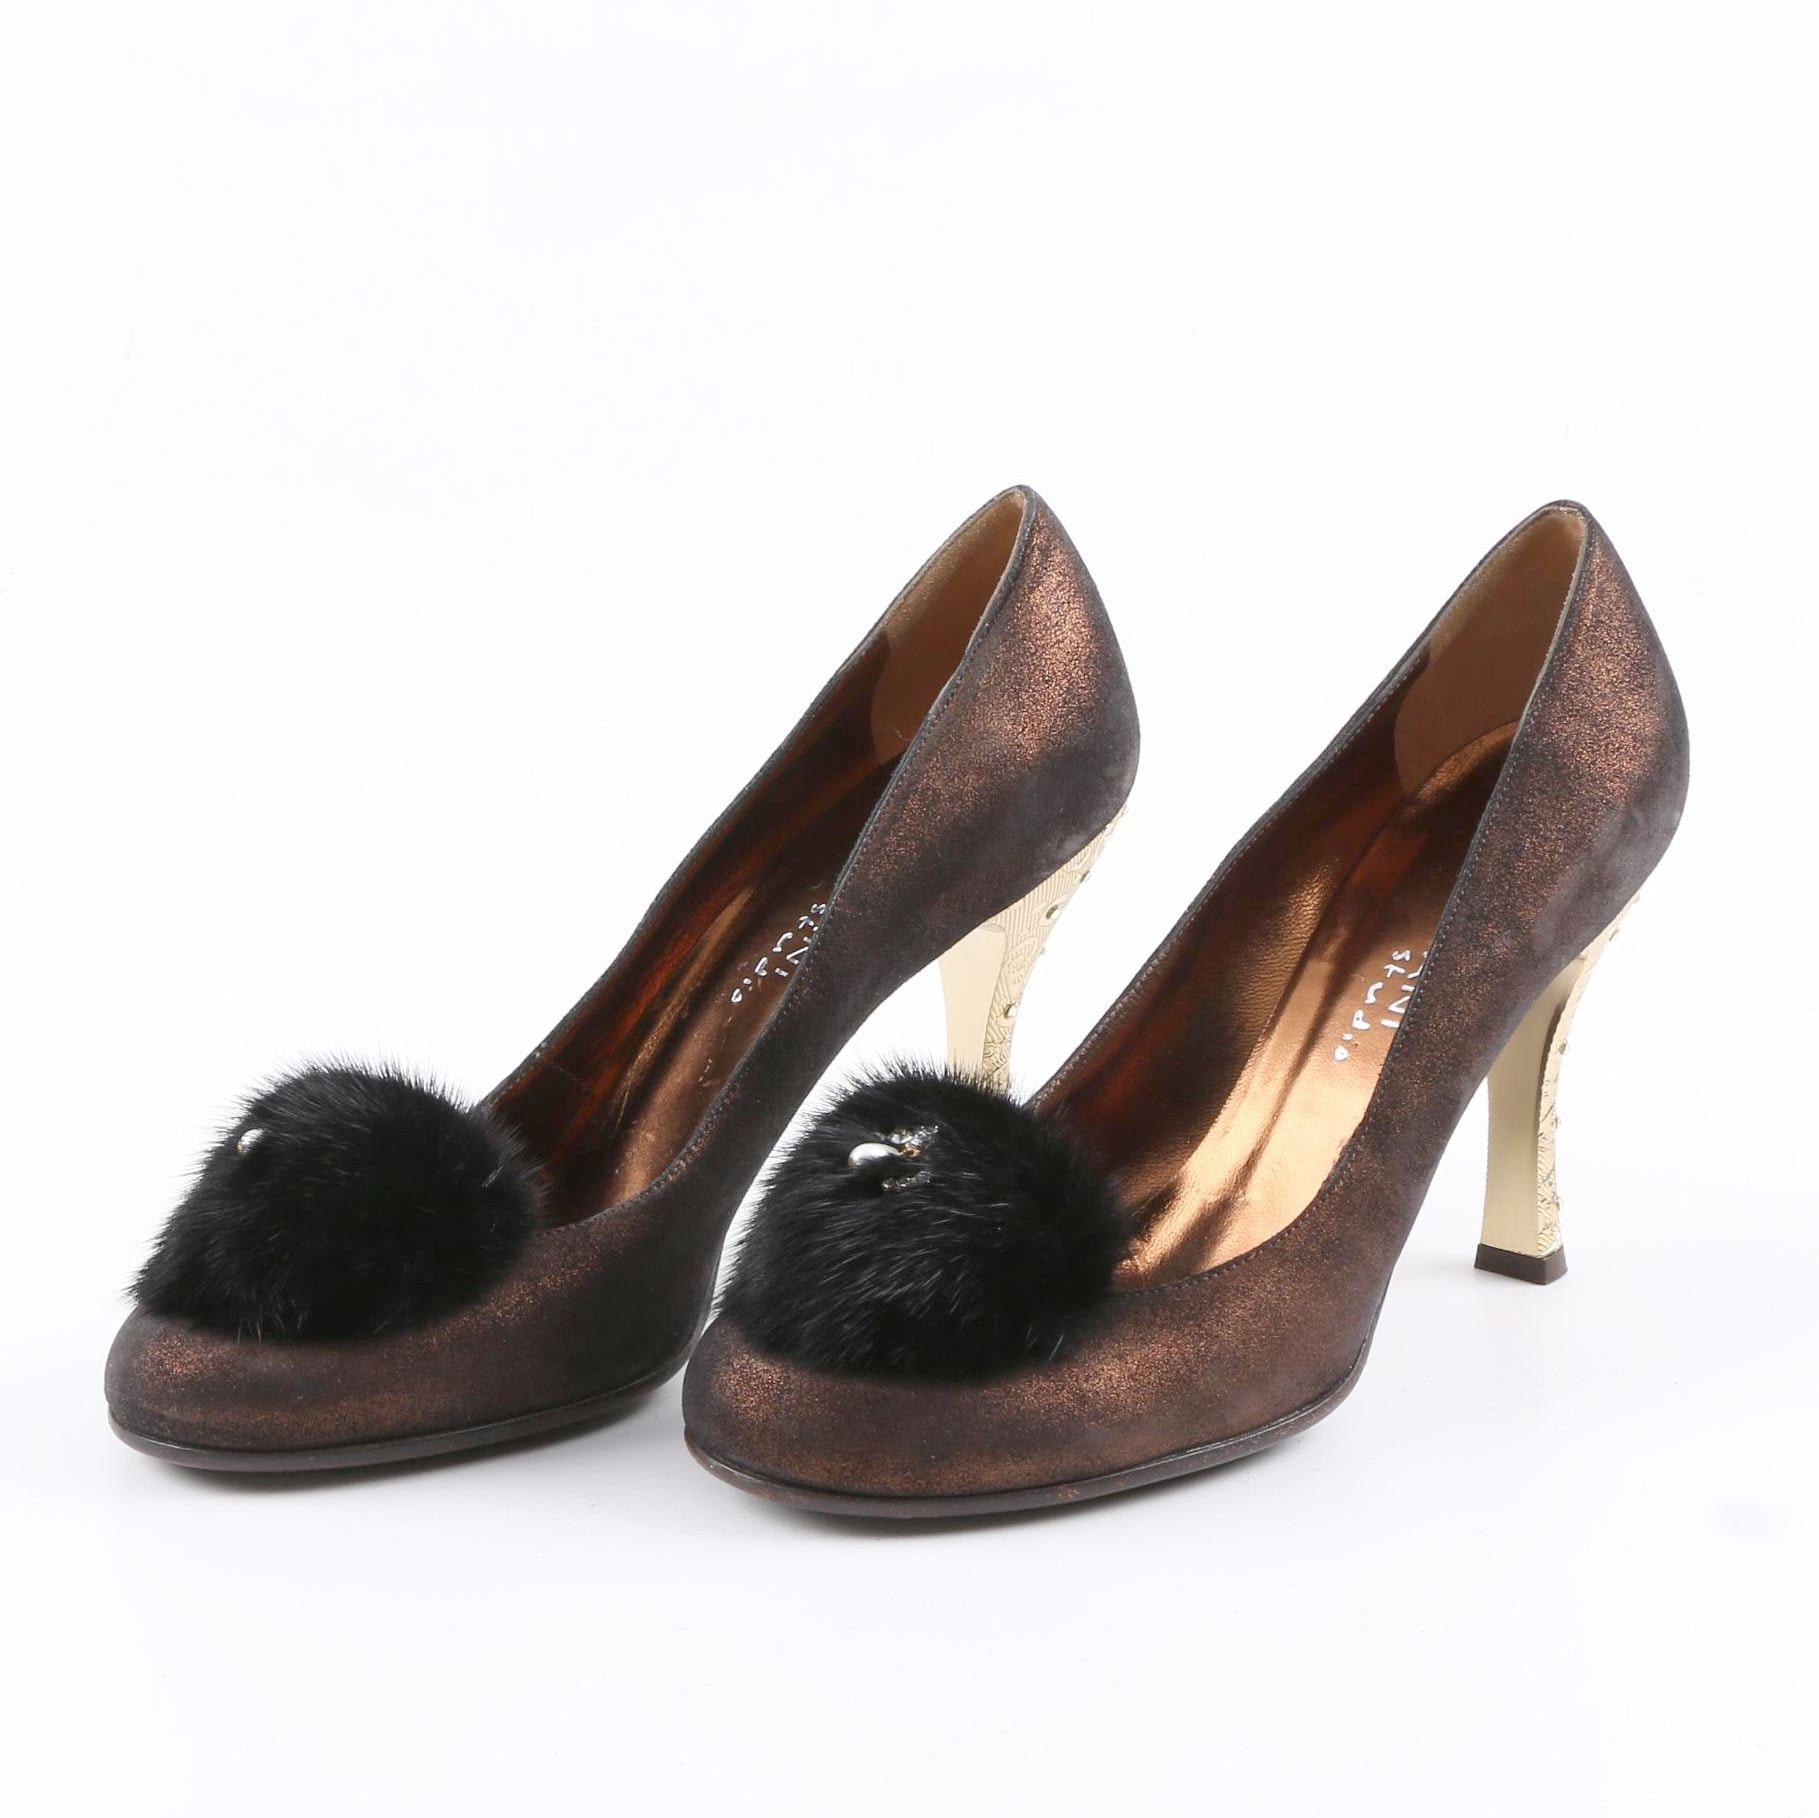 Mariani Studio Brown Leather Pumps